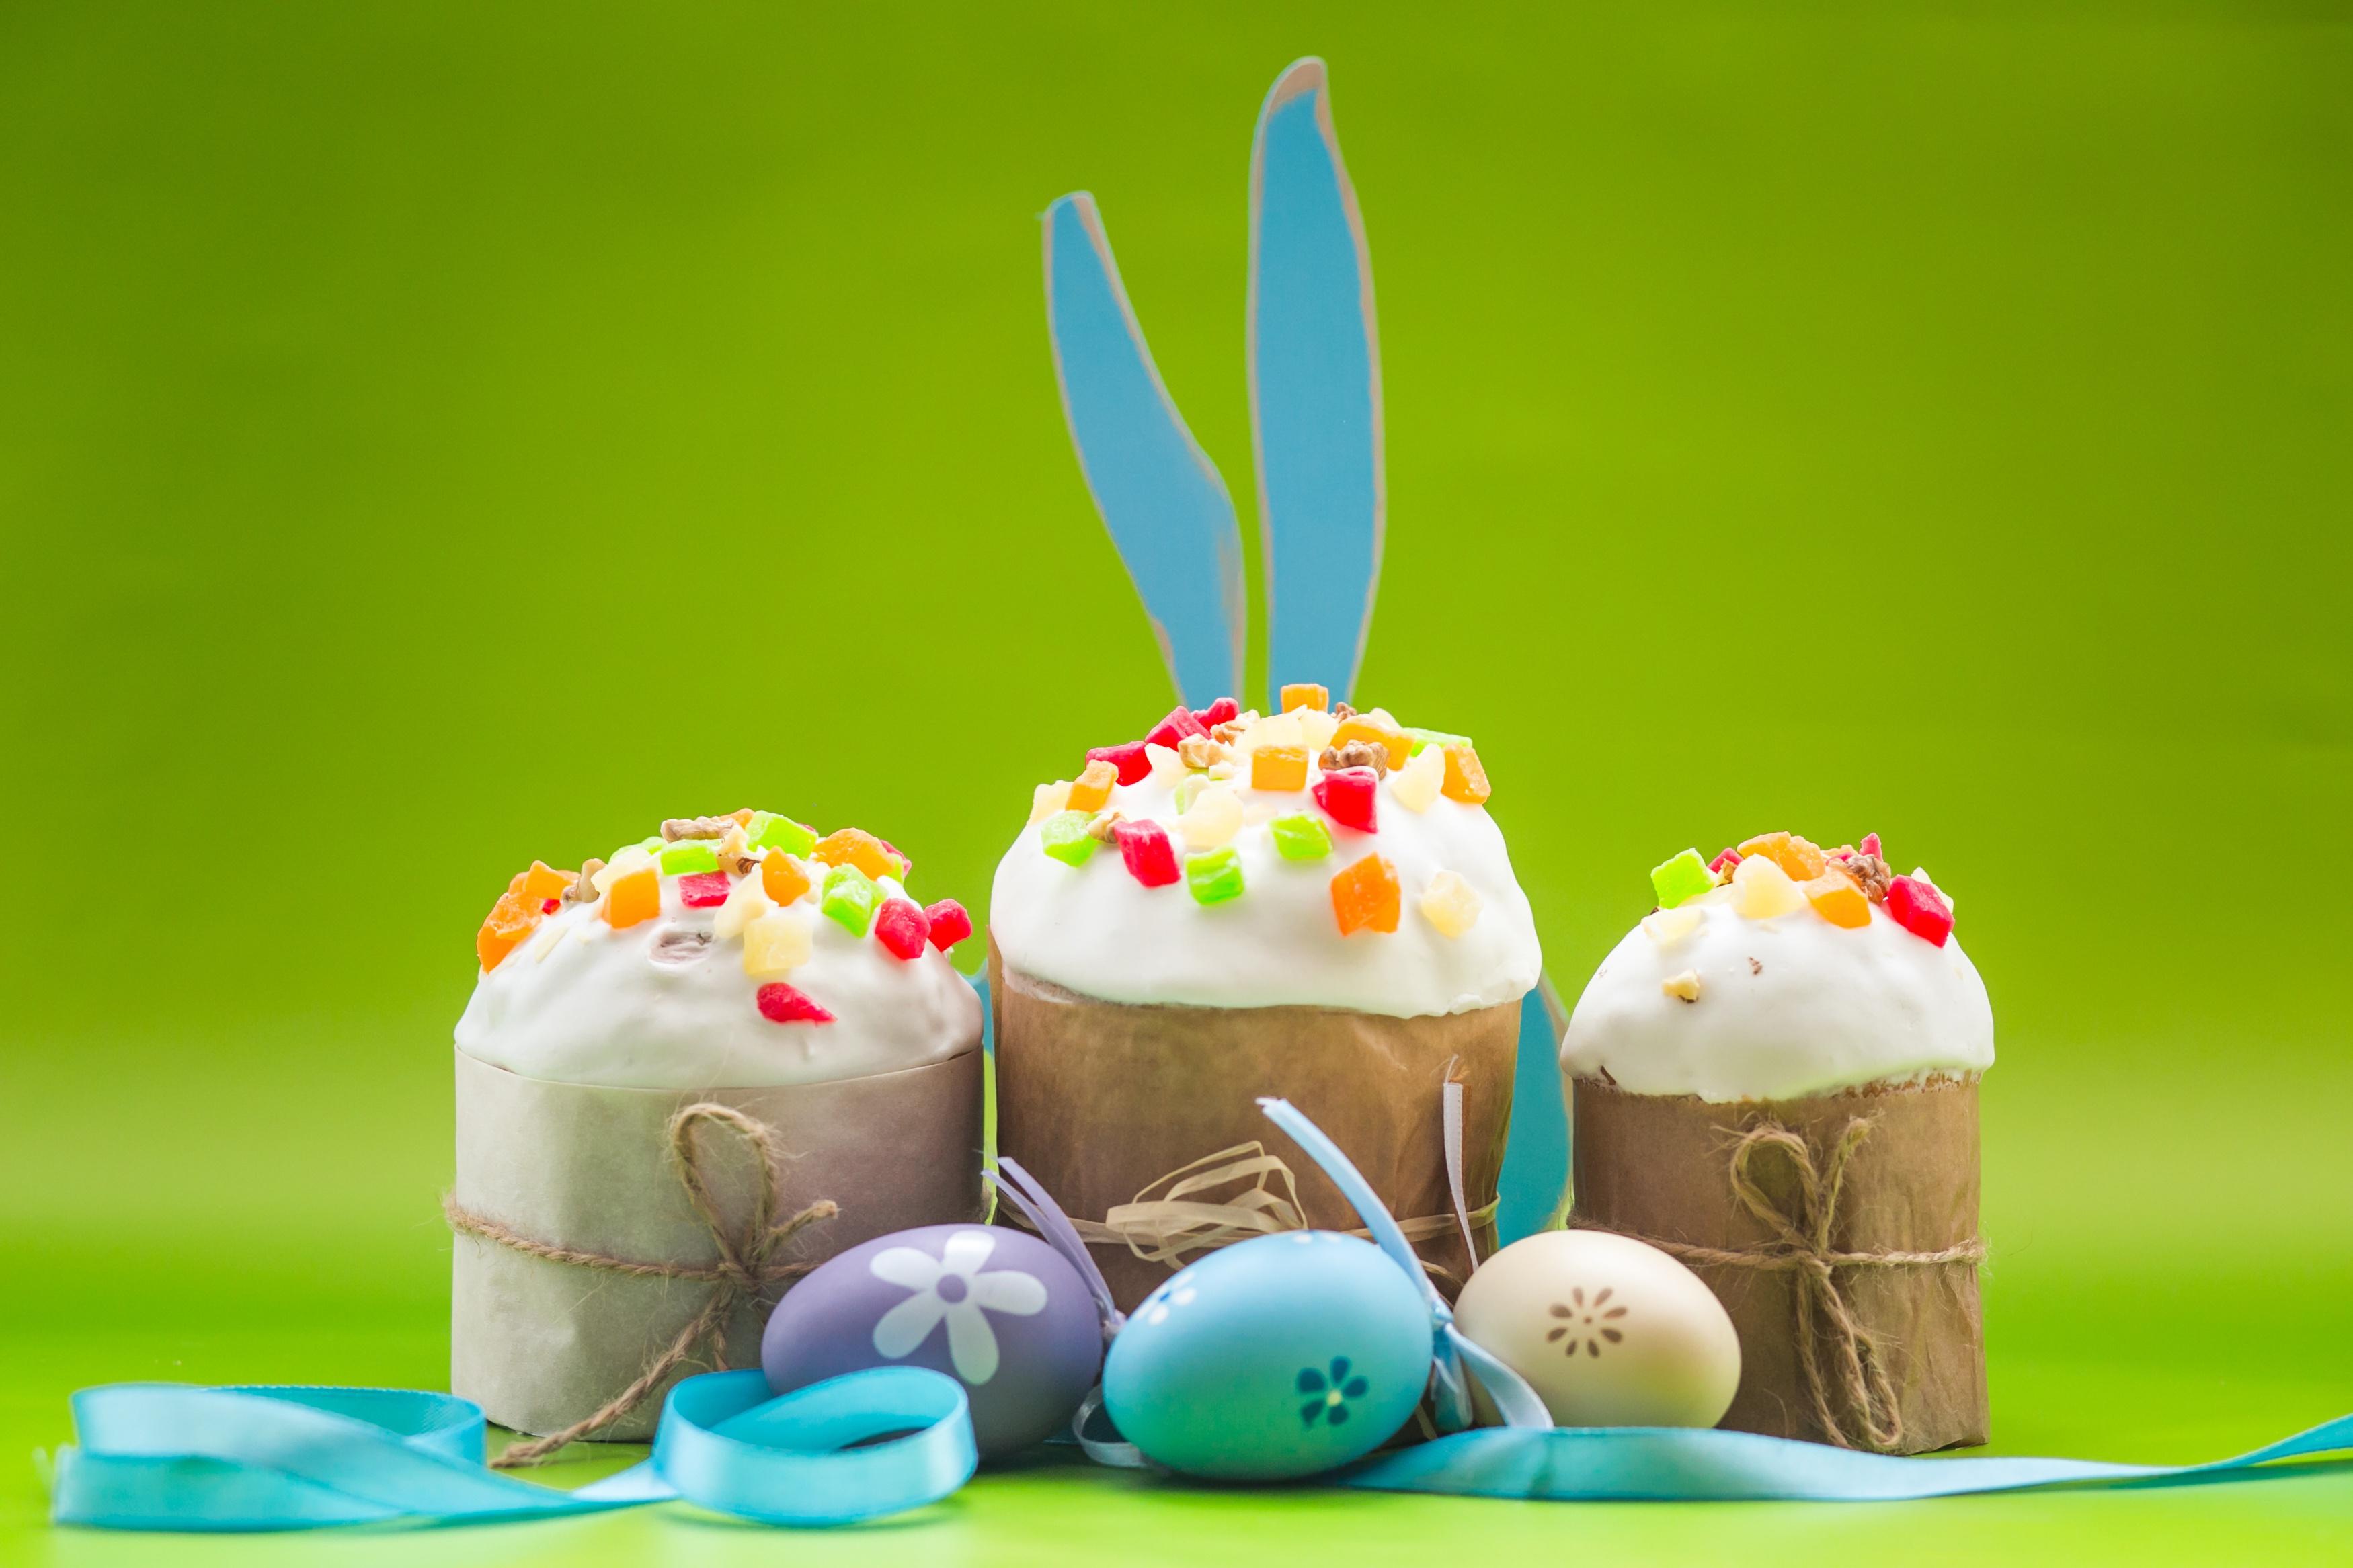 праздник пасха кулич яйца  № 2646779 без смс